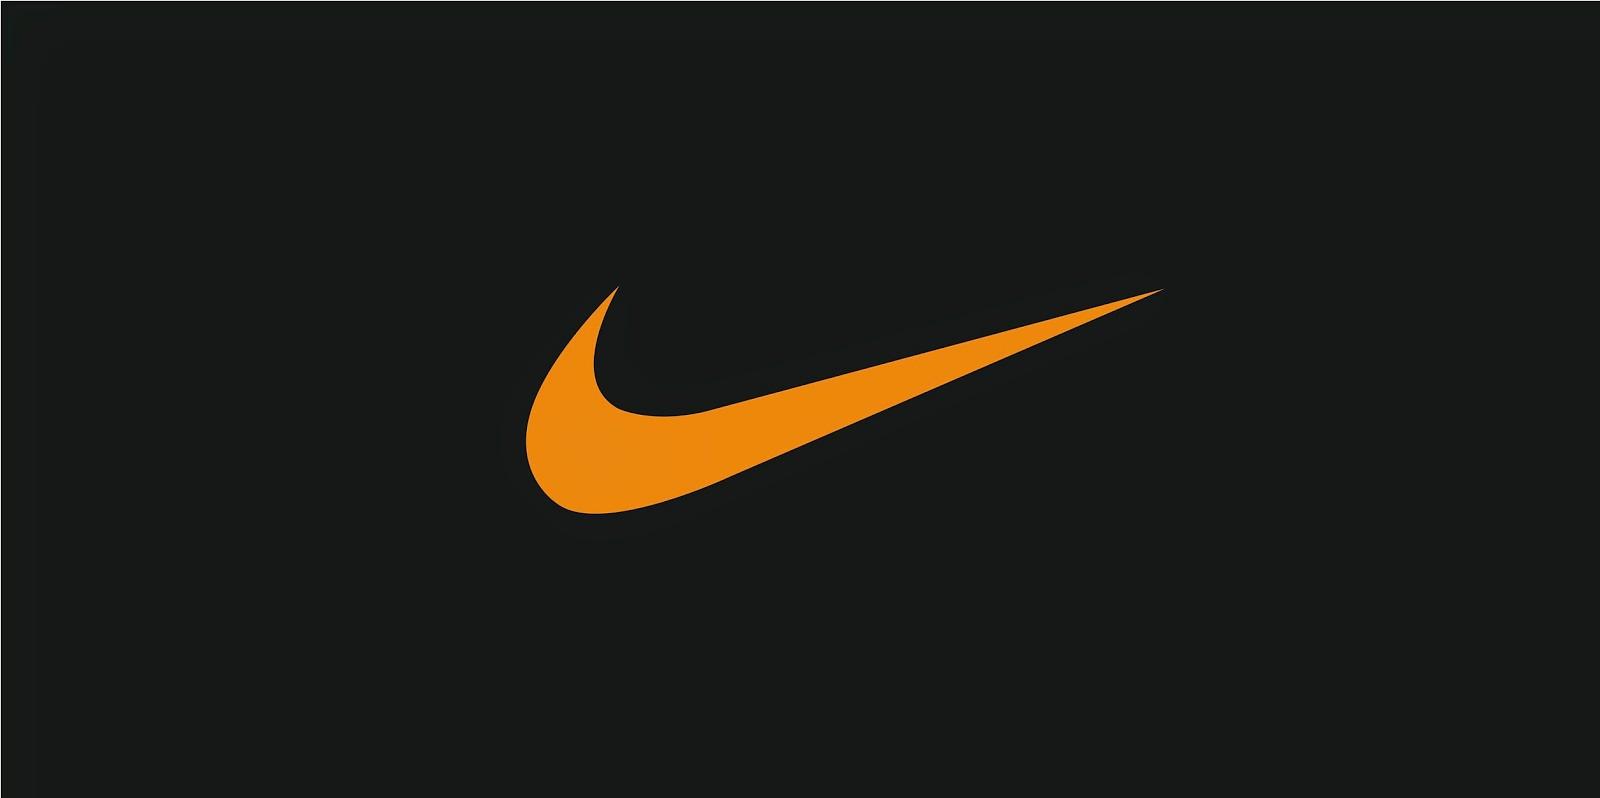 eyesurfing nike wallpaper logo - photo #41